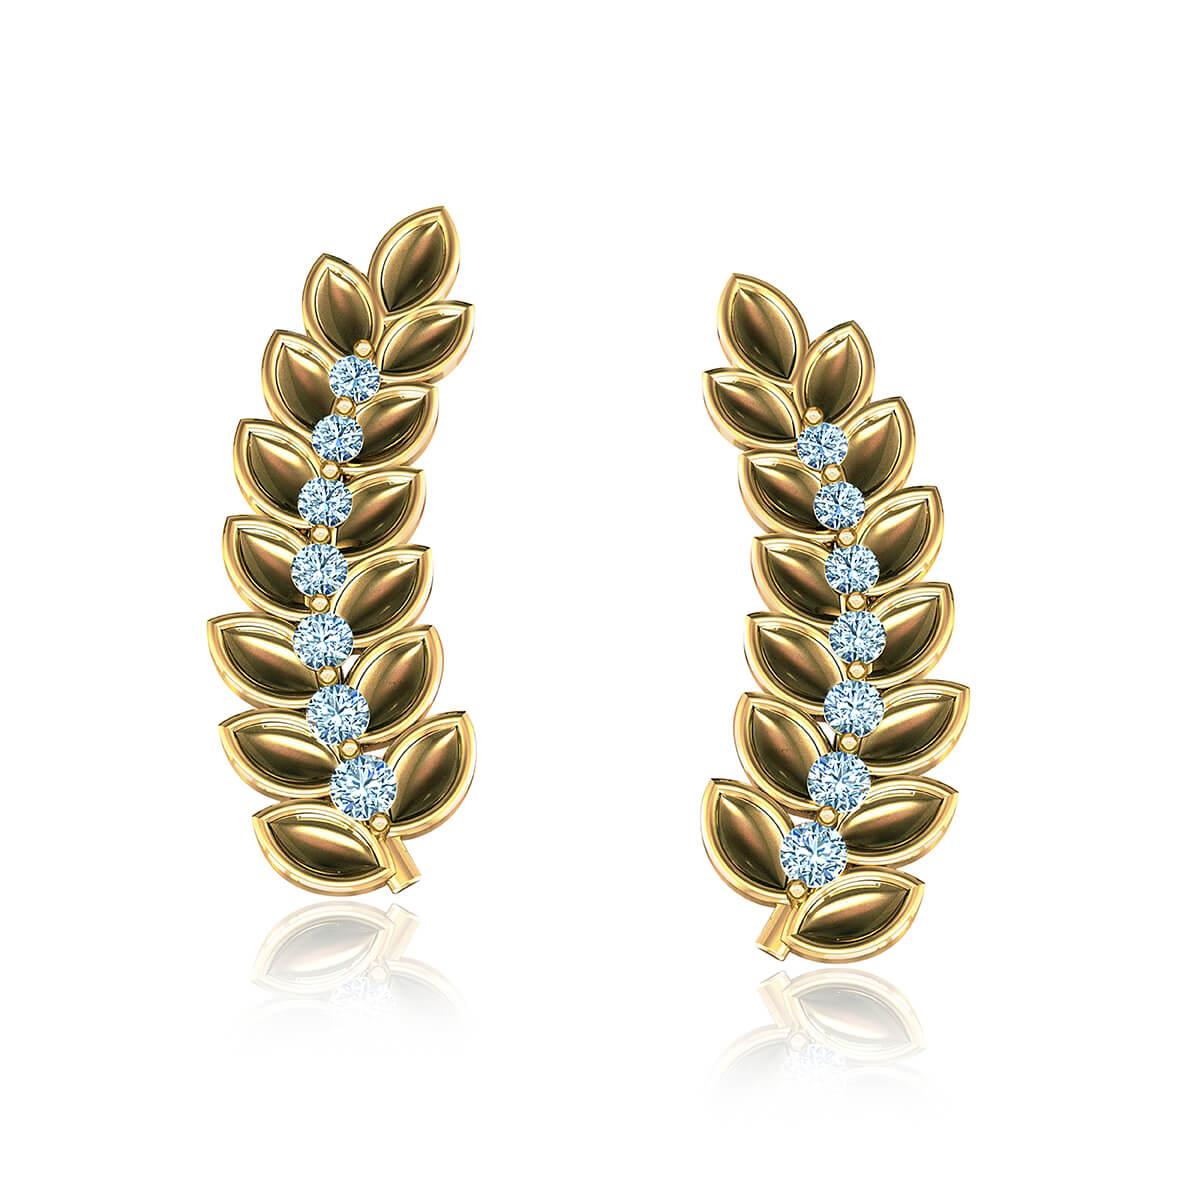 Seedra Goddess Diamond Earrings (1/2 CT. TW.)